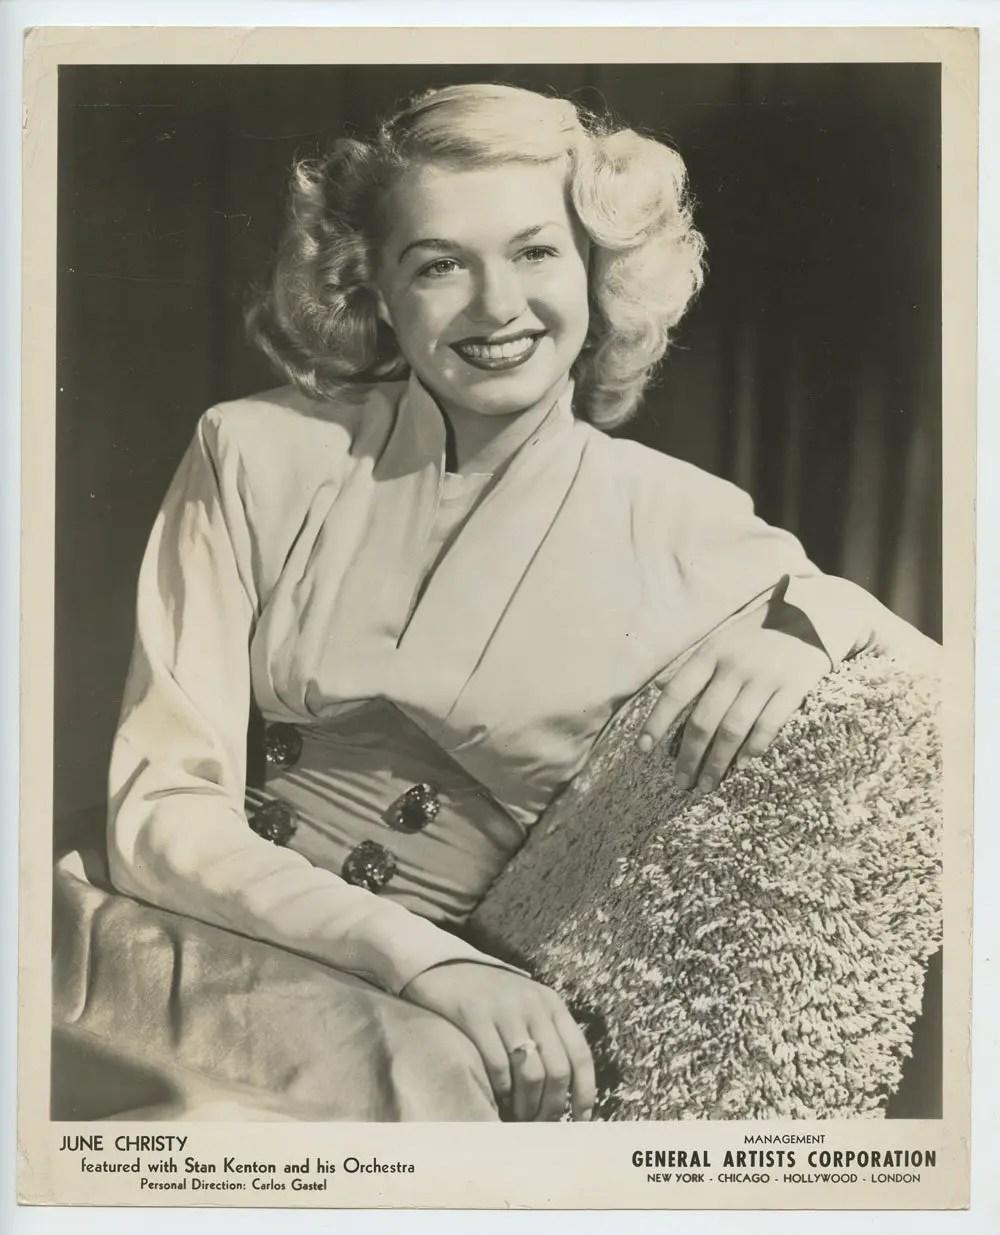 June Chirsty Photo 1950s Publicity Promo Original Vintage